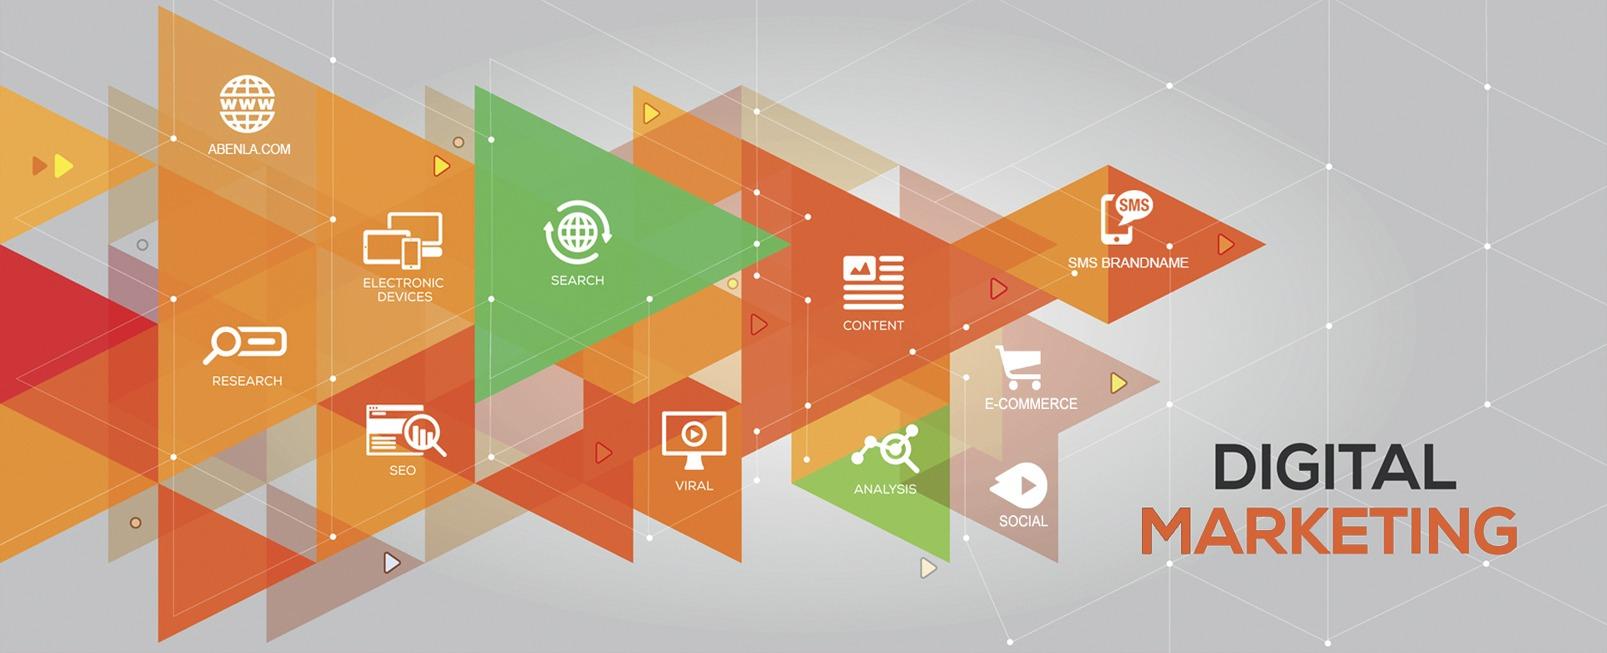 Digital Marketing Abenla